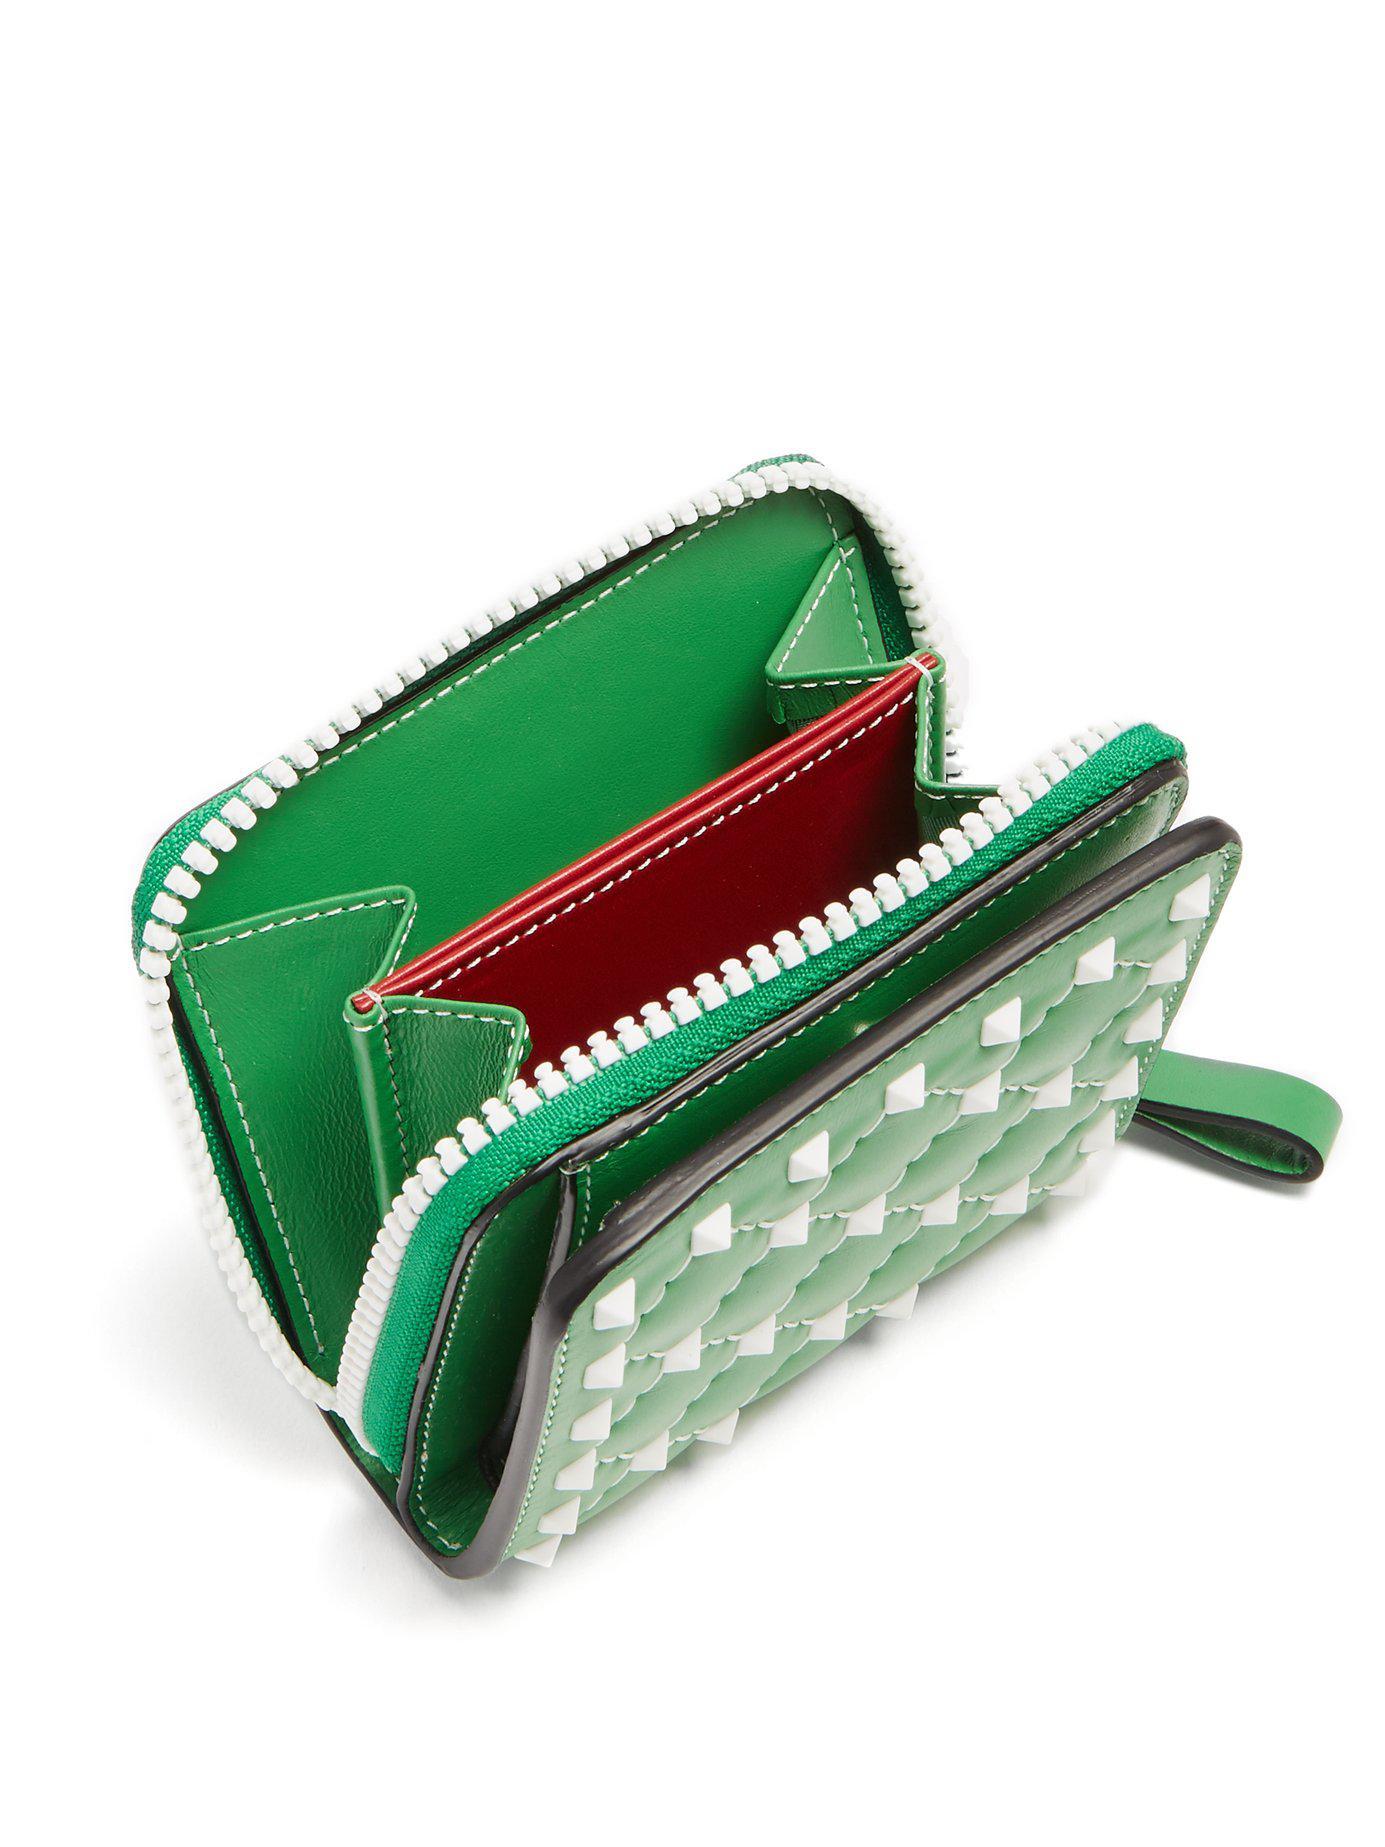 Lyst - Valentino Rockstud Spike Zip Around Leather Wallet in Green - Save  34% d7249eee7102f